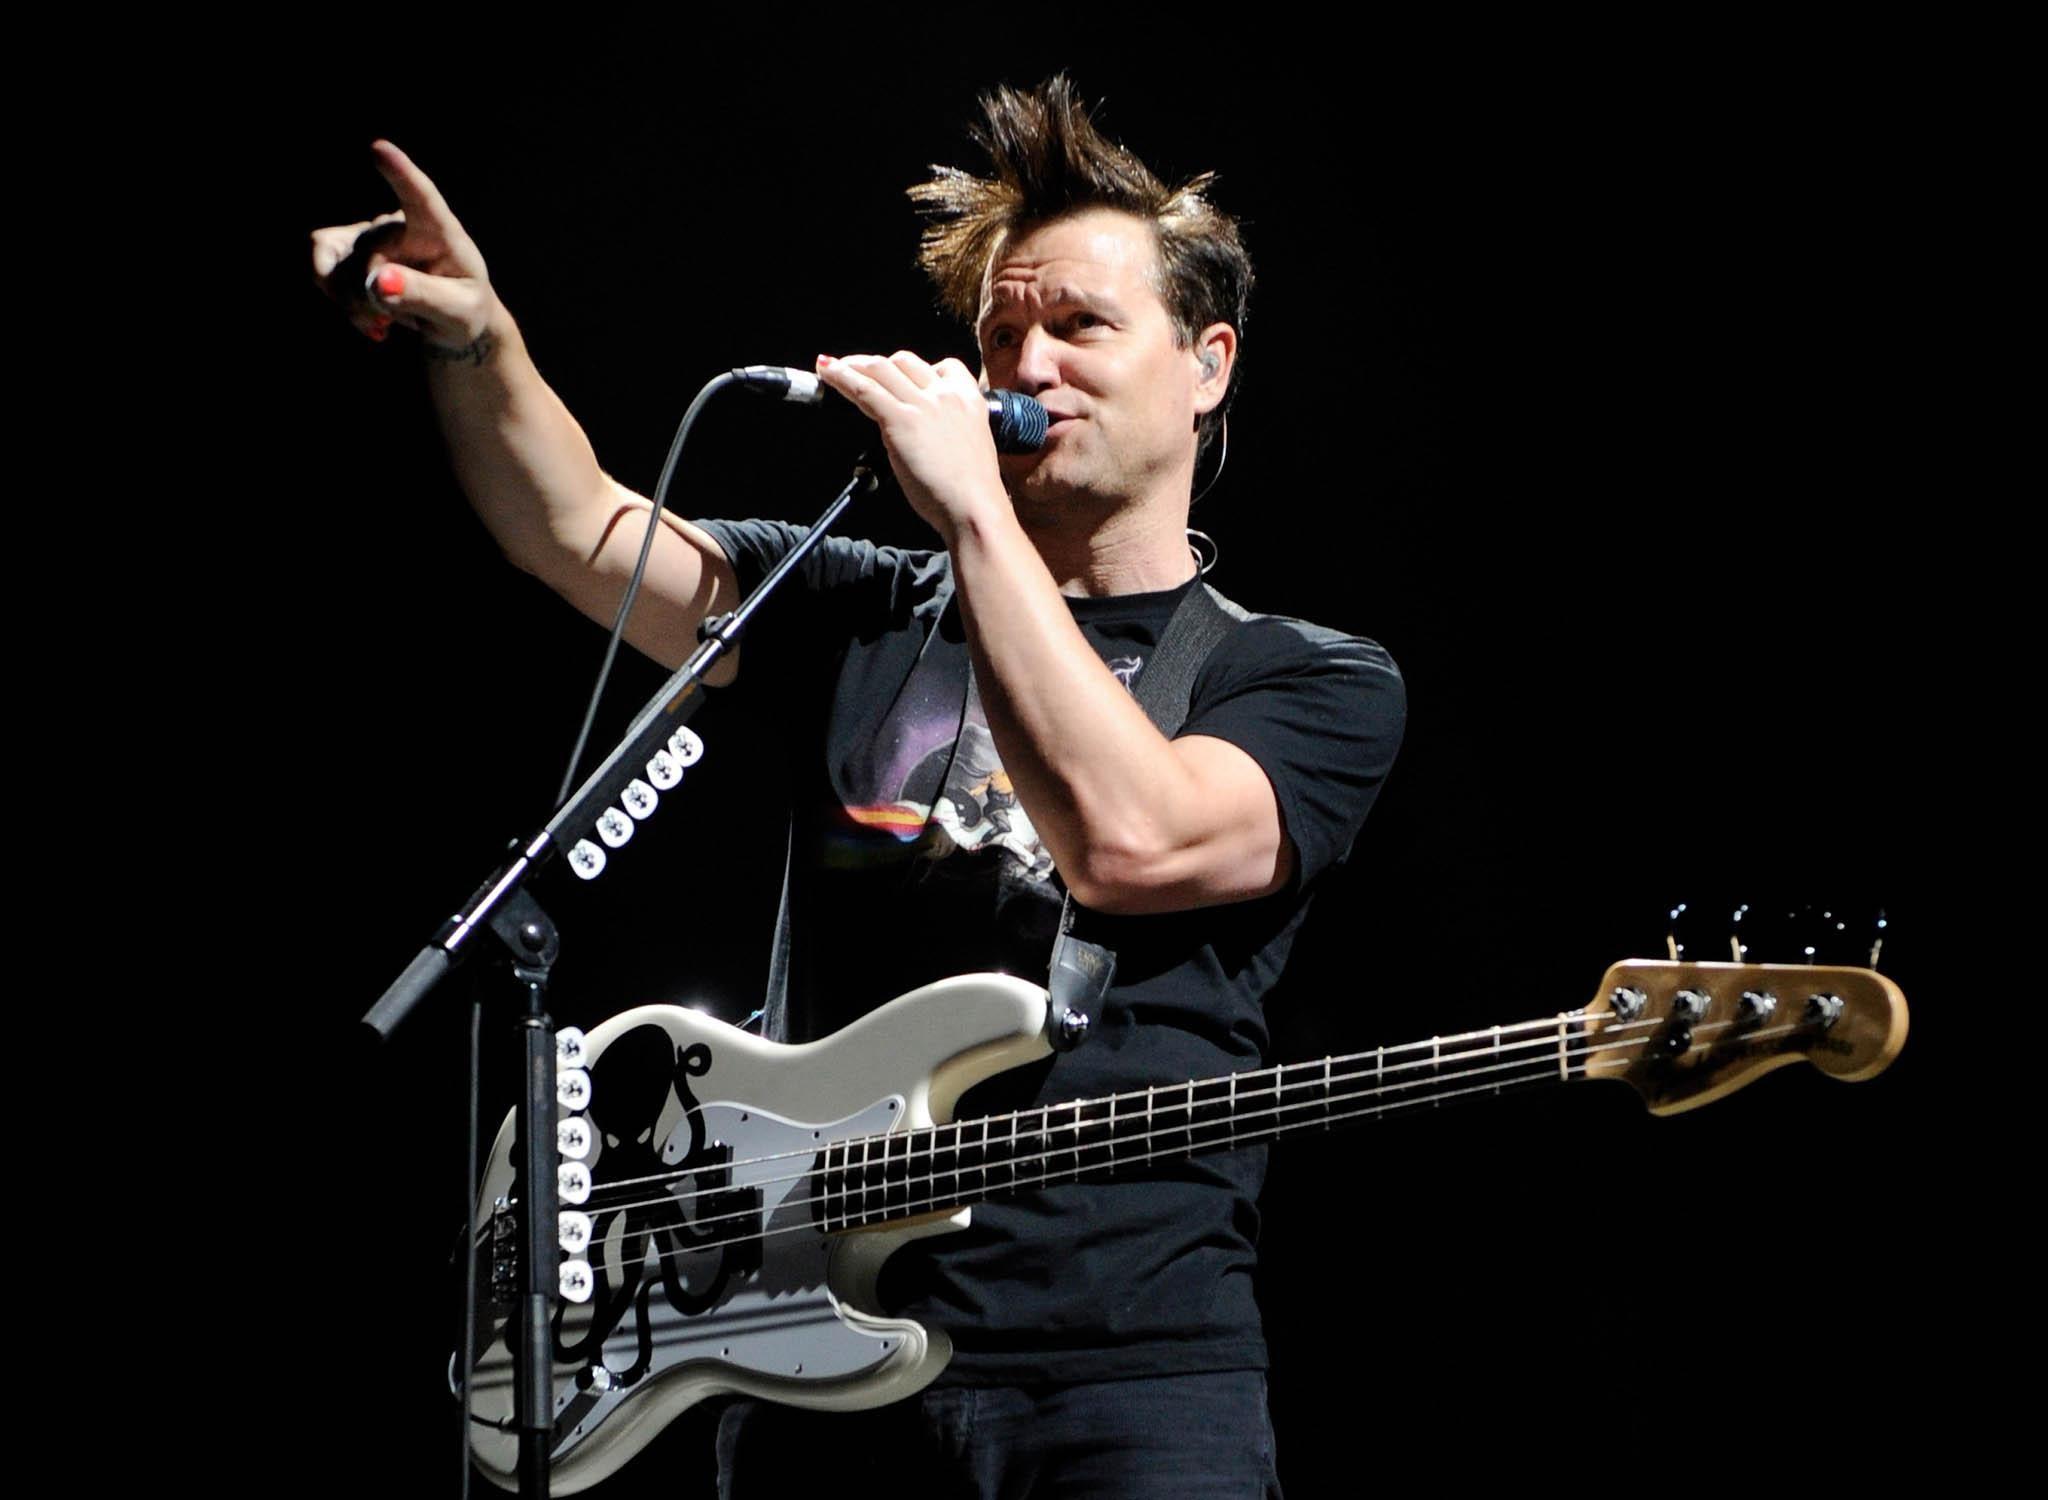 Read Tom Delonges Open Letter About Blink 182 Split Our